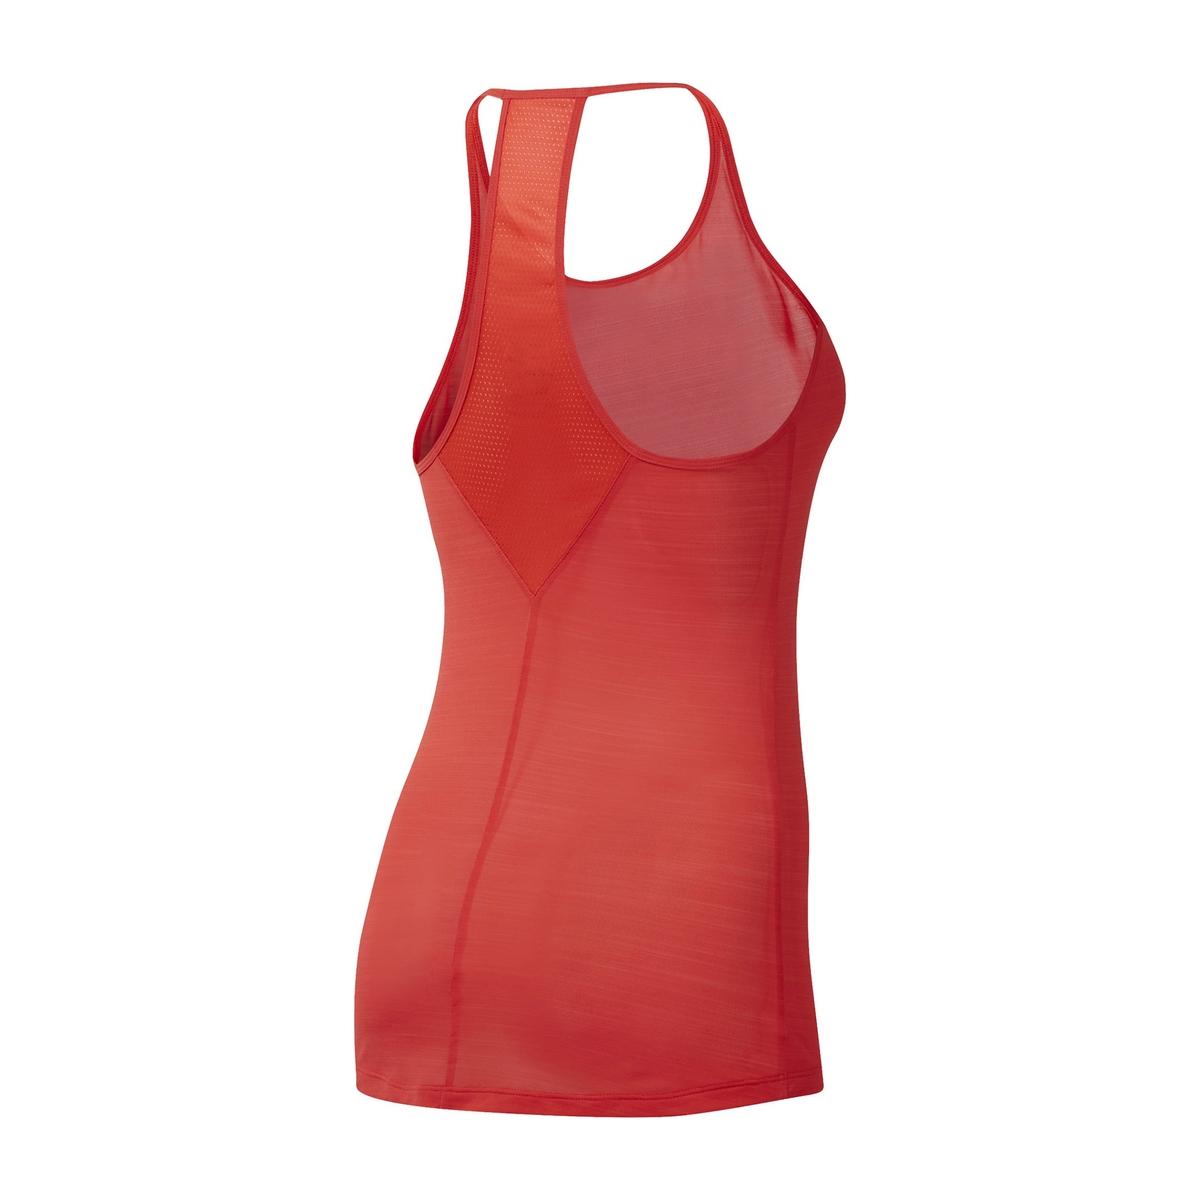 Imagen secundaria de producto de Camiseta de tirantes finos - Reebok